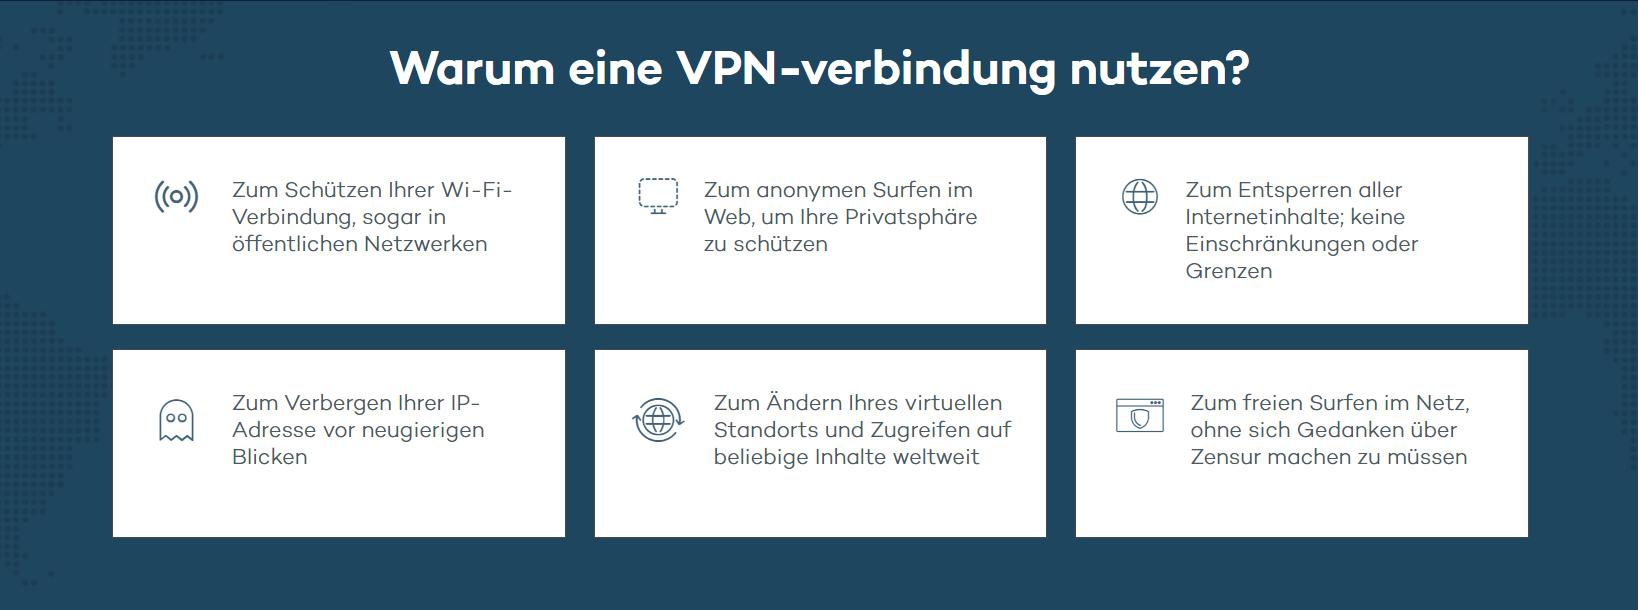 Panda VPN_Vorteile VPN